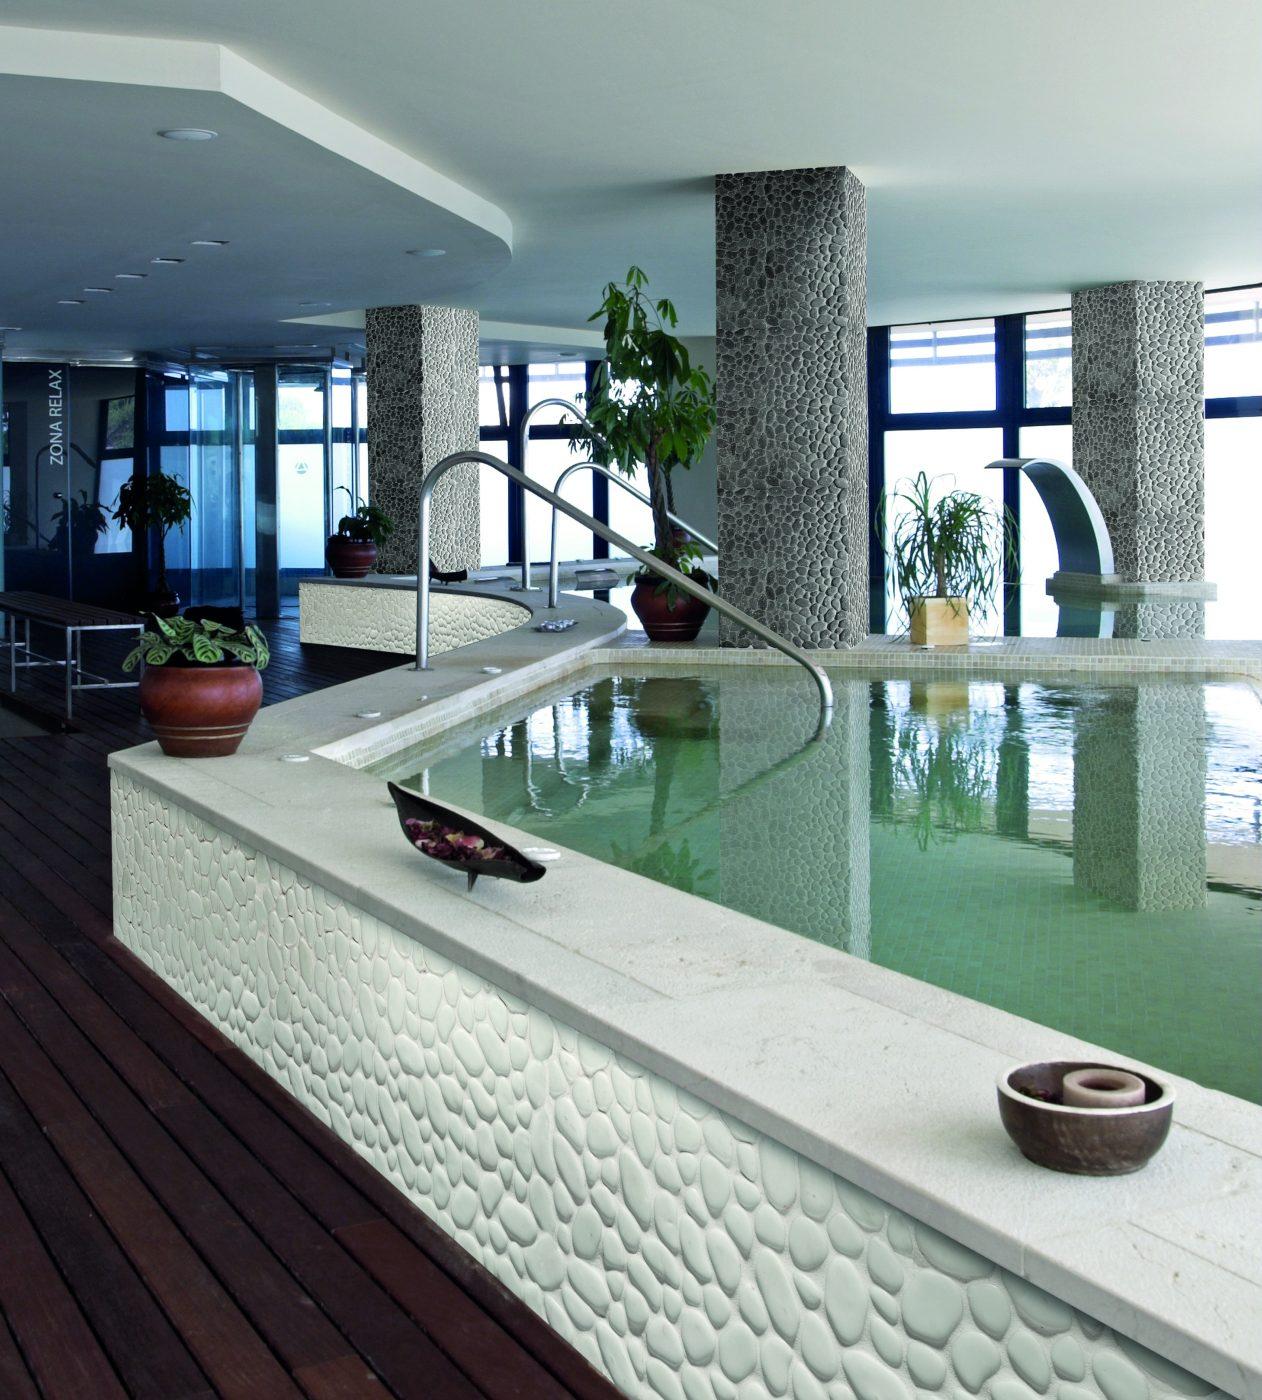 Carrelage Salle De Bain Irun ~ carrelage faience salle de bain capbreton valceram